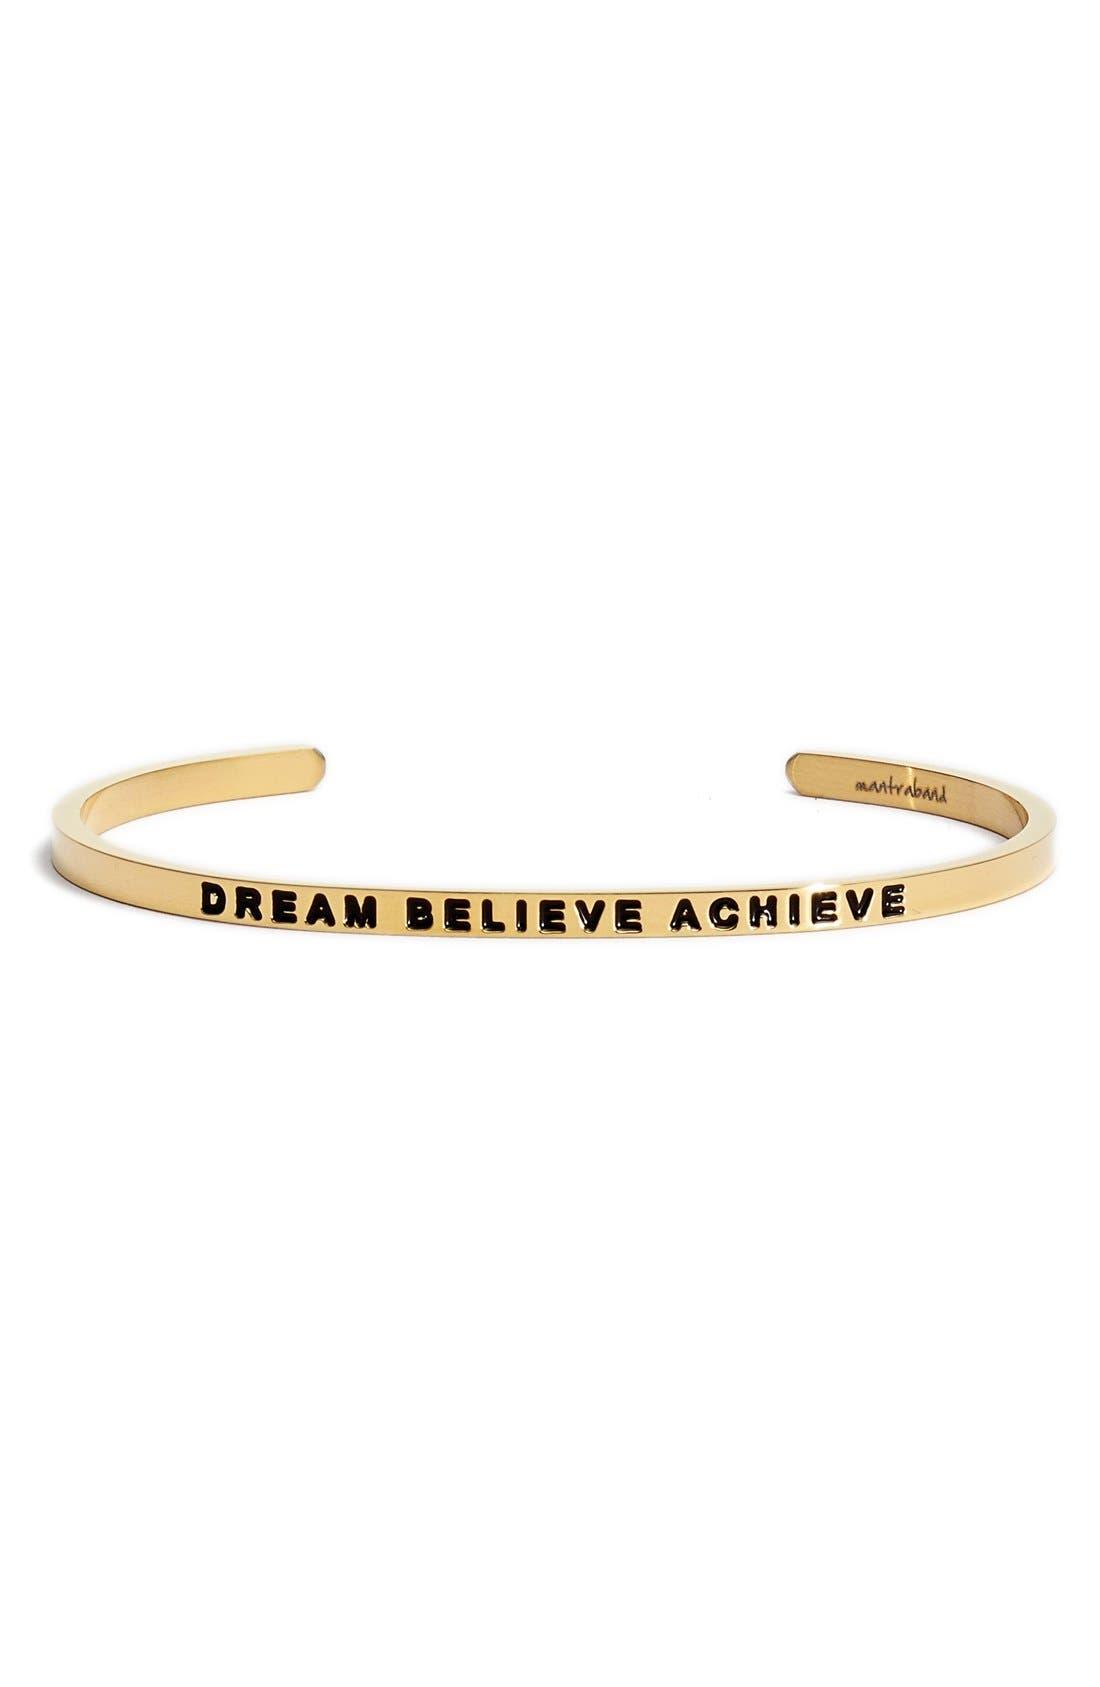 MANTRABAND 'Dream Believe Achieve' Cuff